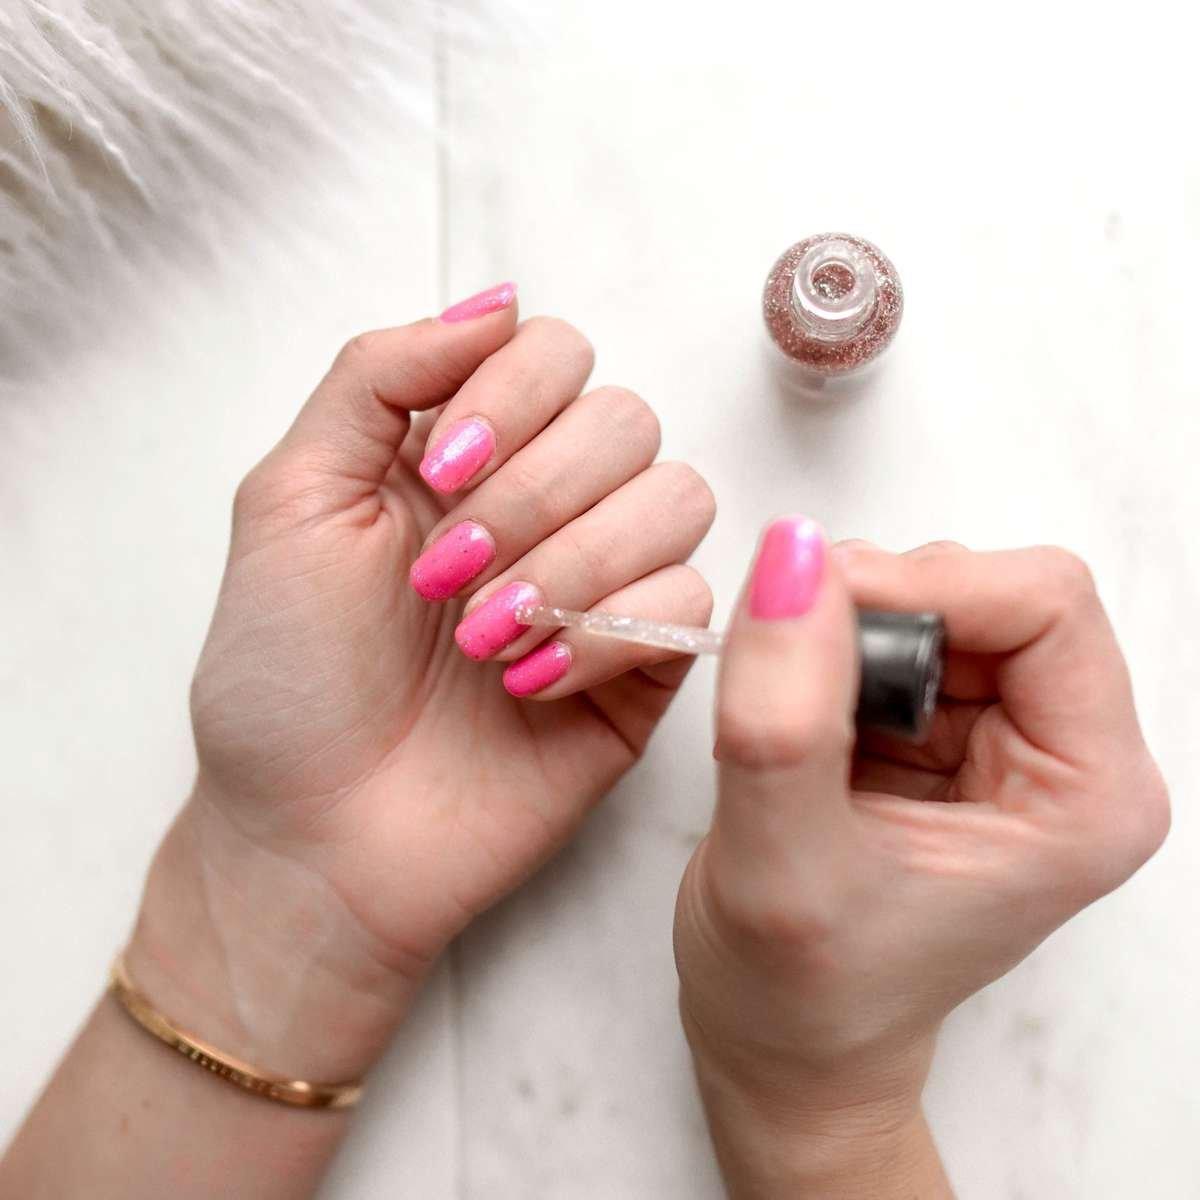 Spring Jasmine Fragrance Scent Persona nails.